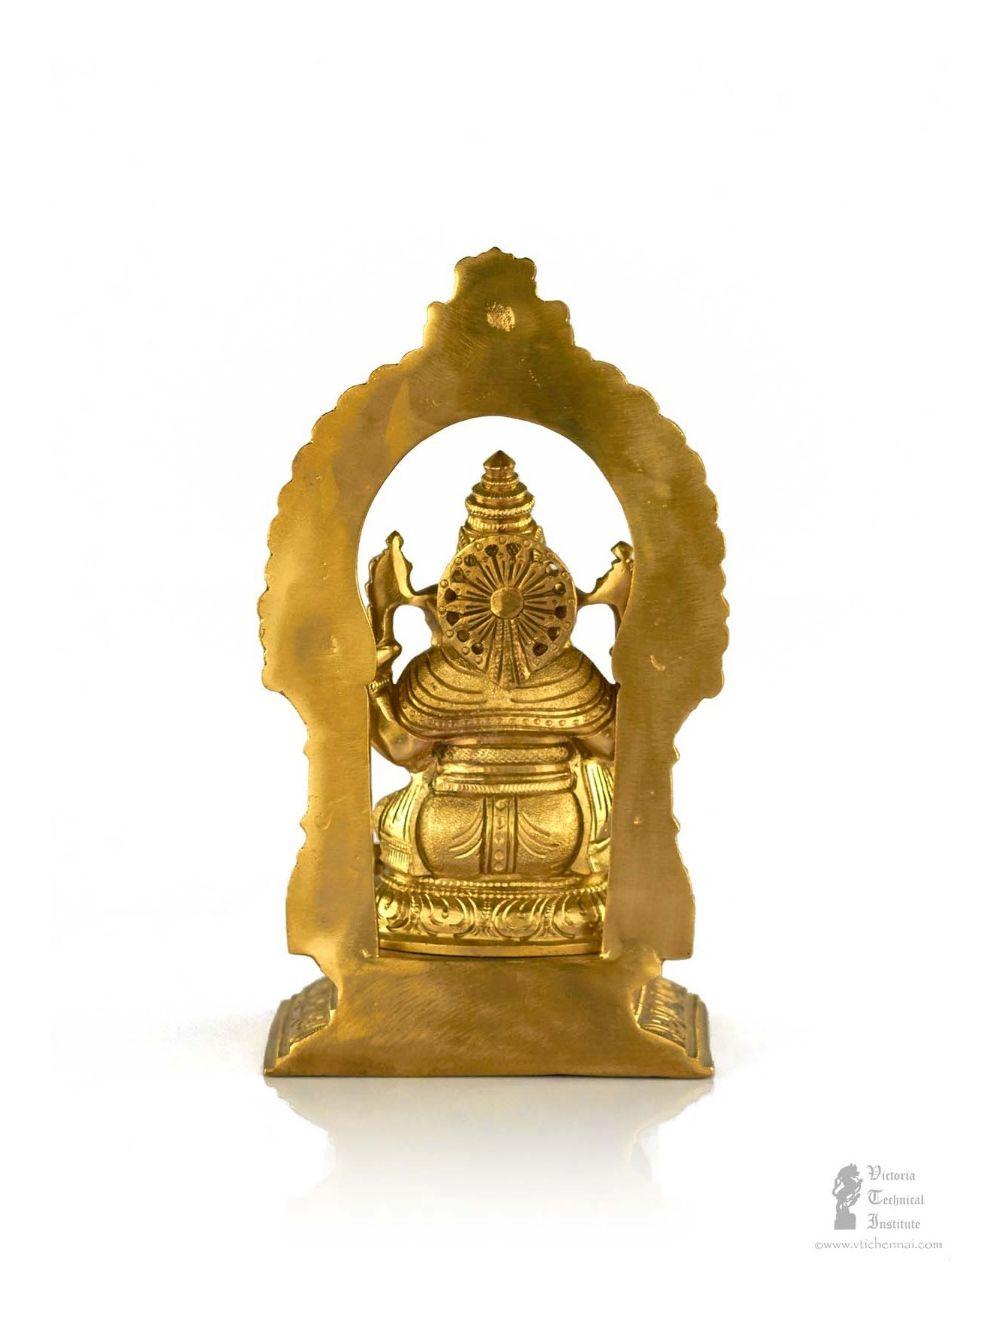 20 Cm Indian Hindu God Ganesh Brass Statue Vti Chennai